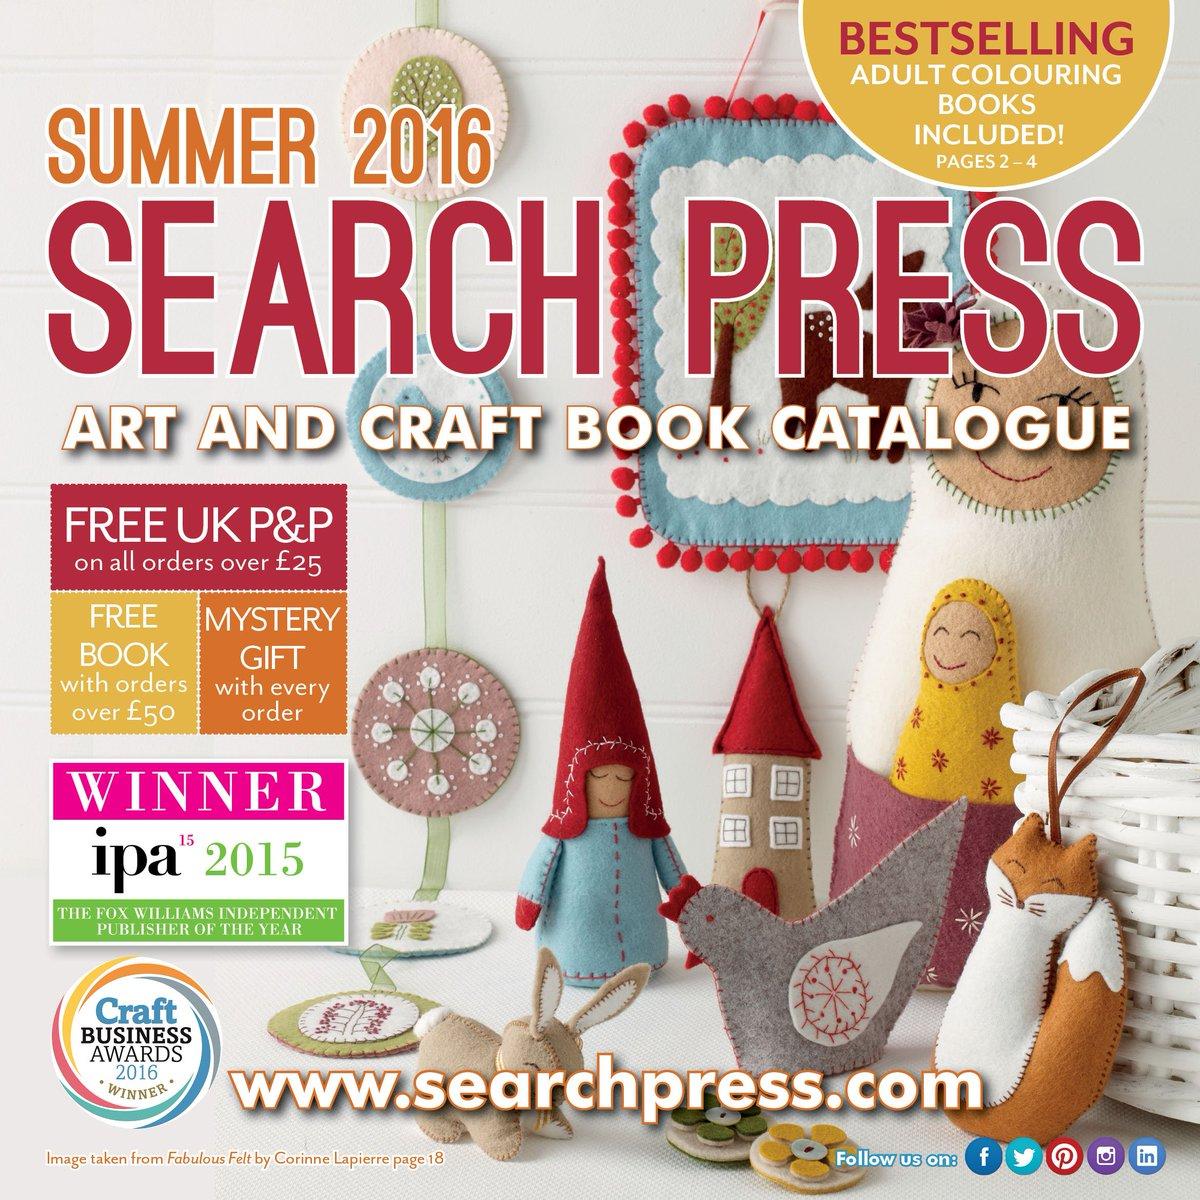 925041e76666 Search Press Books on Twitter